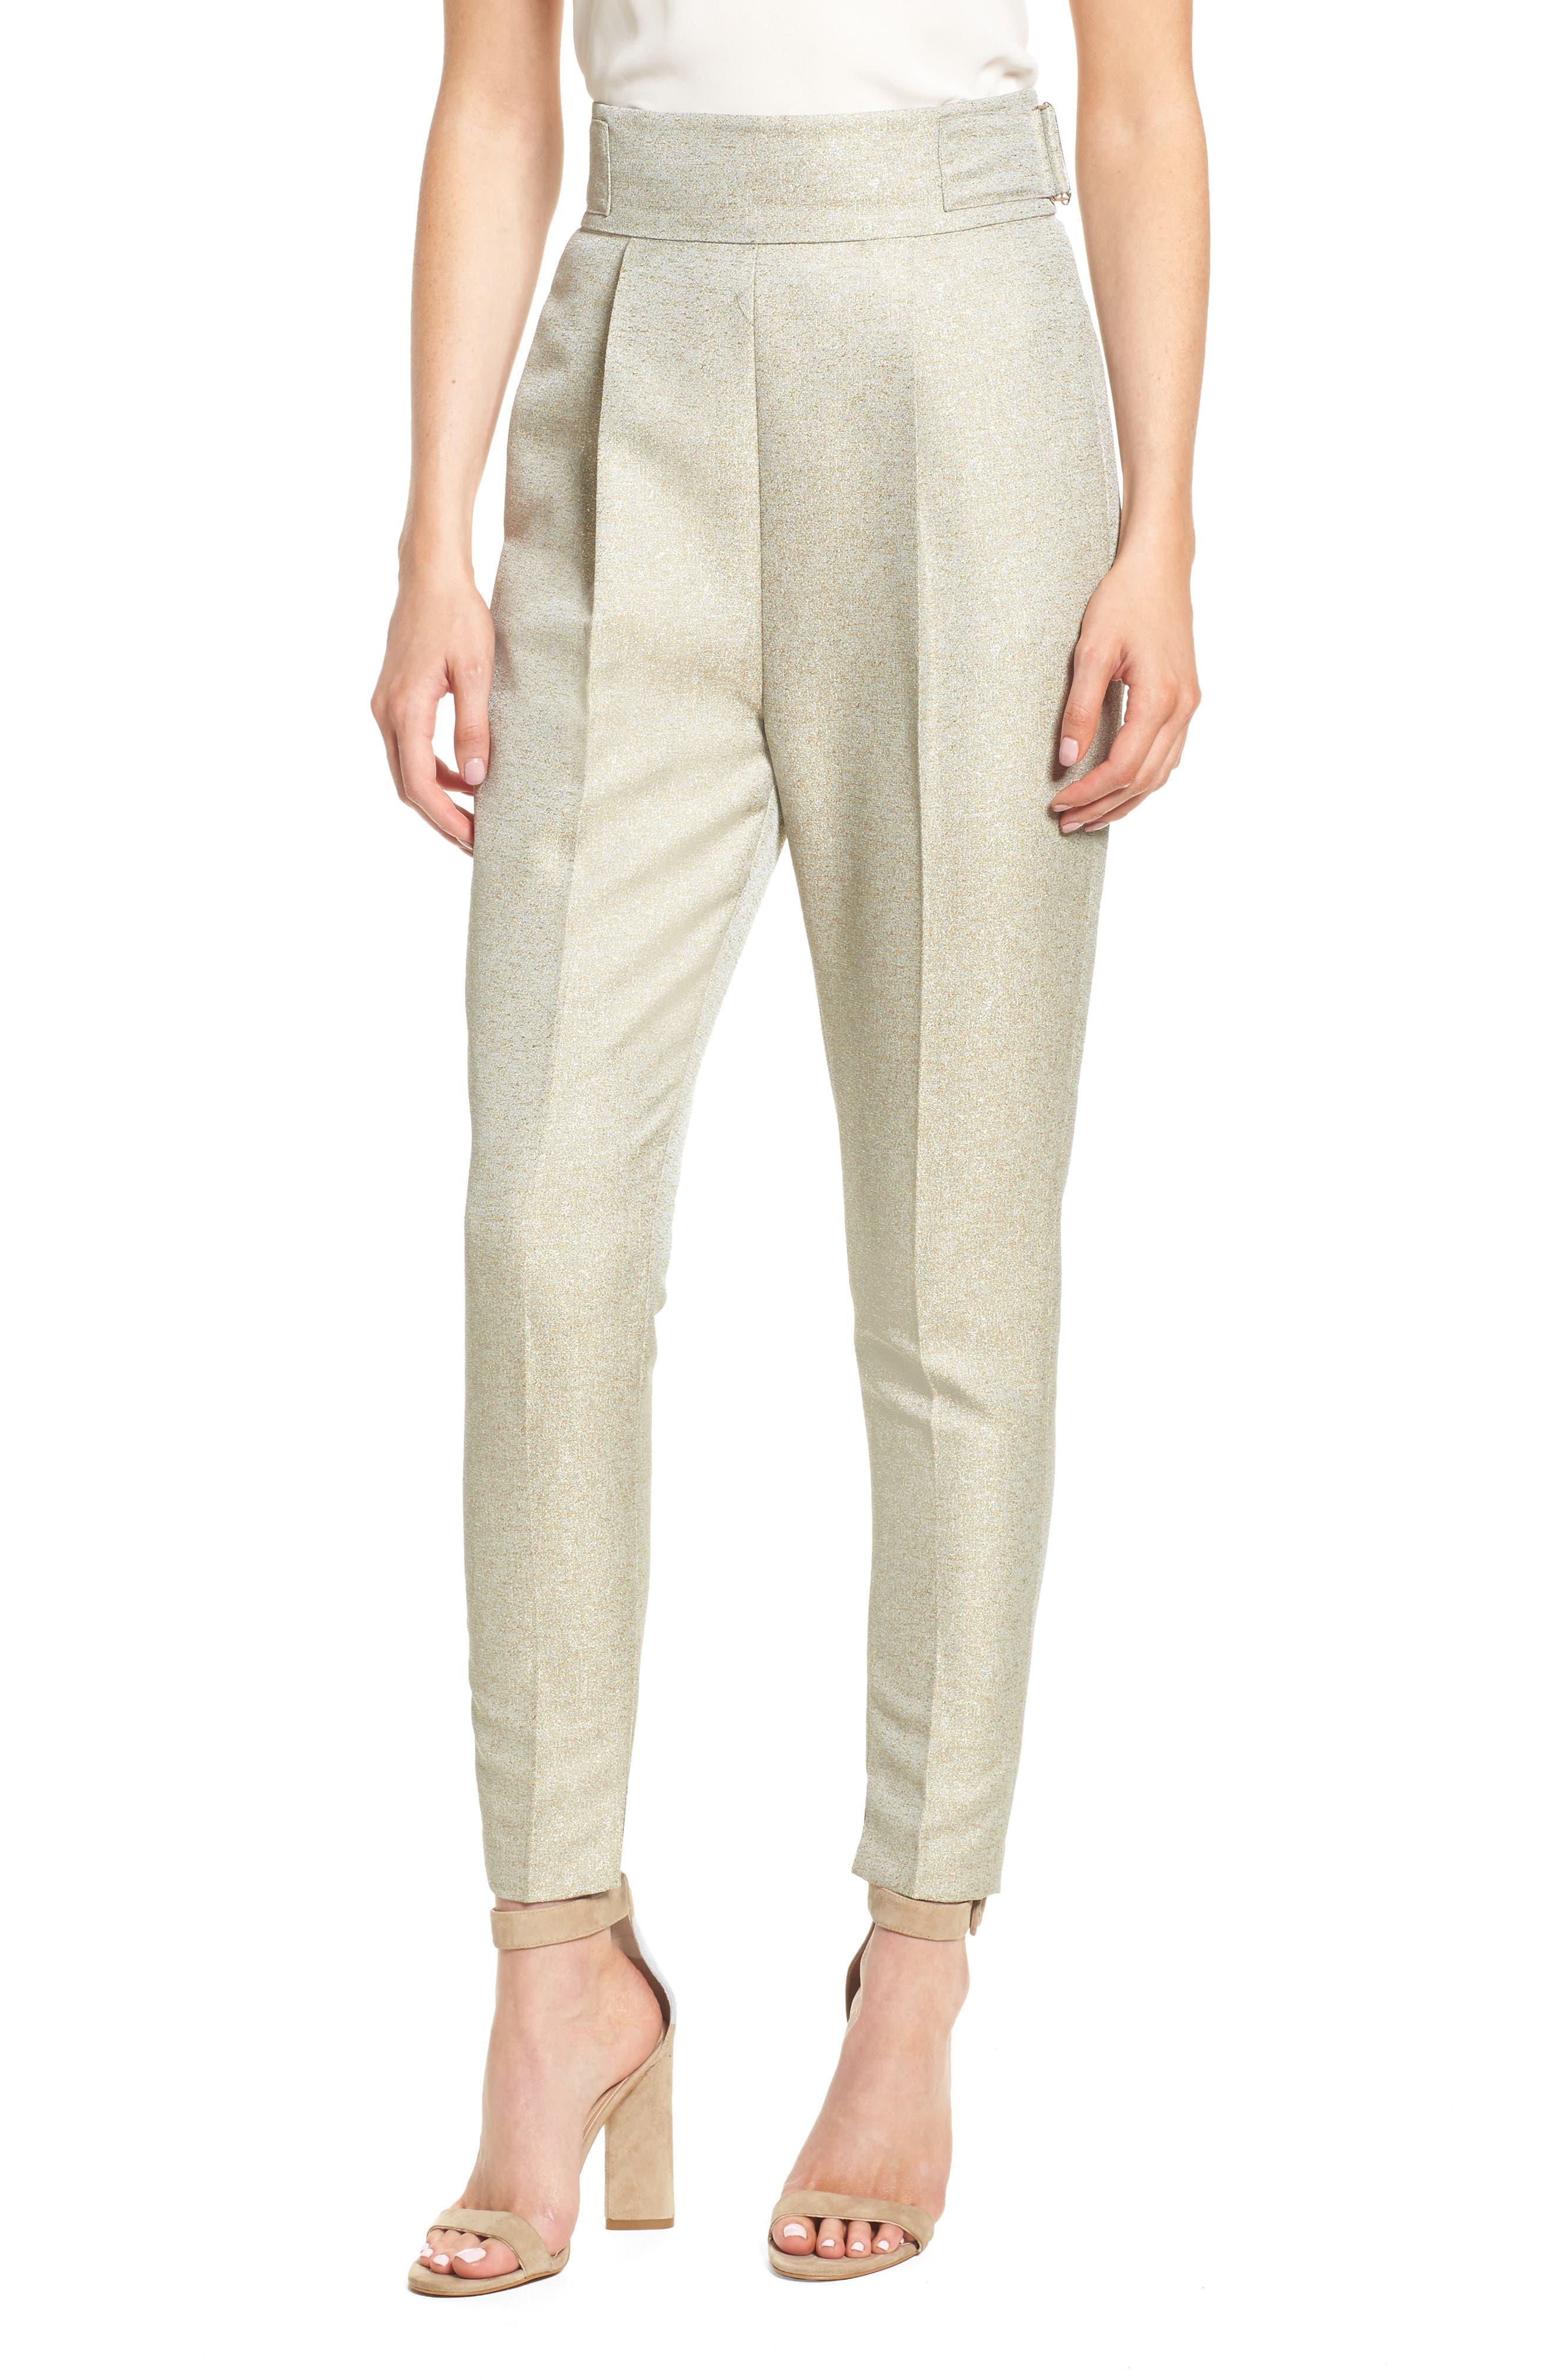 Valencia High Waist Ankle Skinny Pants,                         Main,                         color, 076